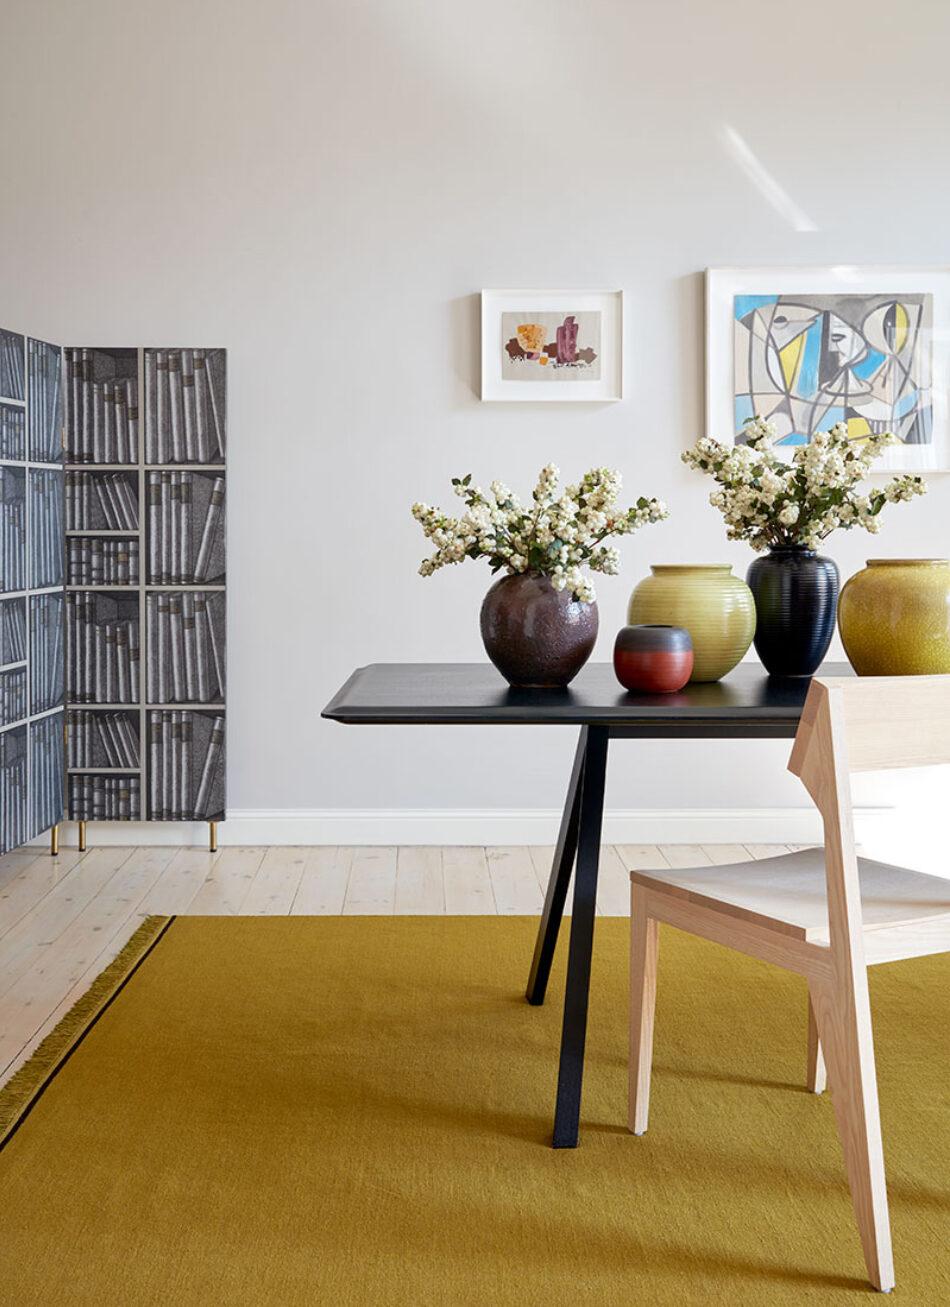 Antonius Schimmelbusch_Apartment Berlin_Hiepler, Brunier + Ragner Schmuck_privat_05